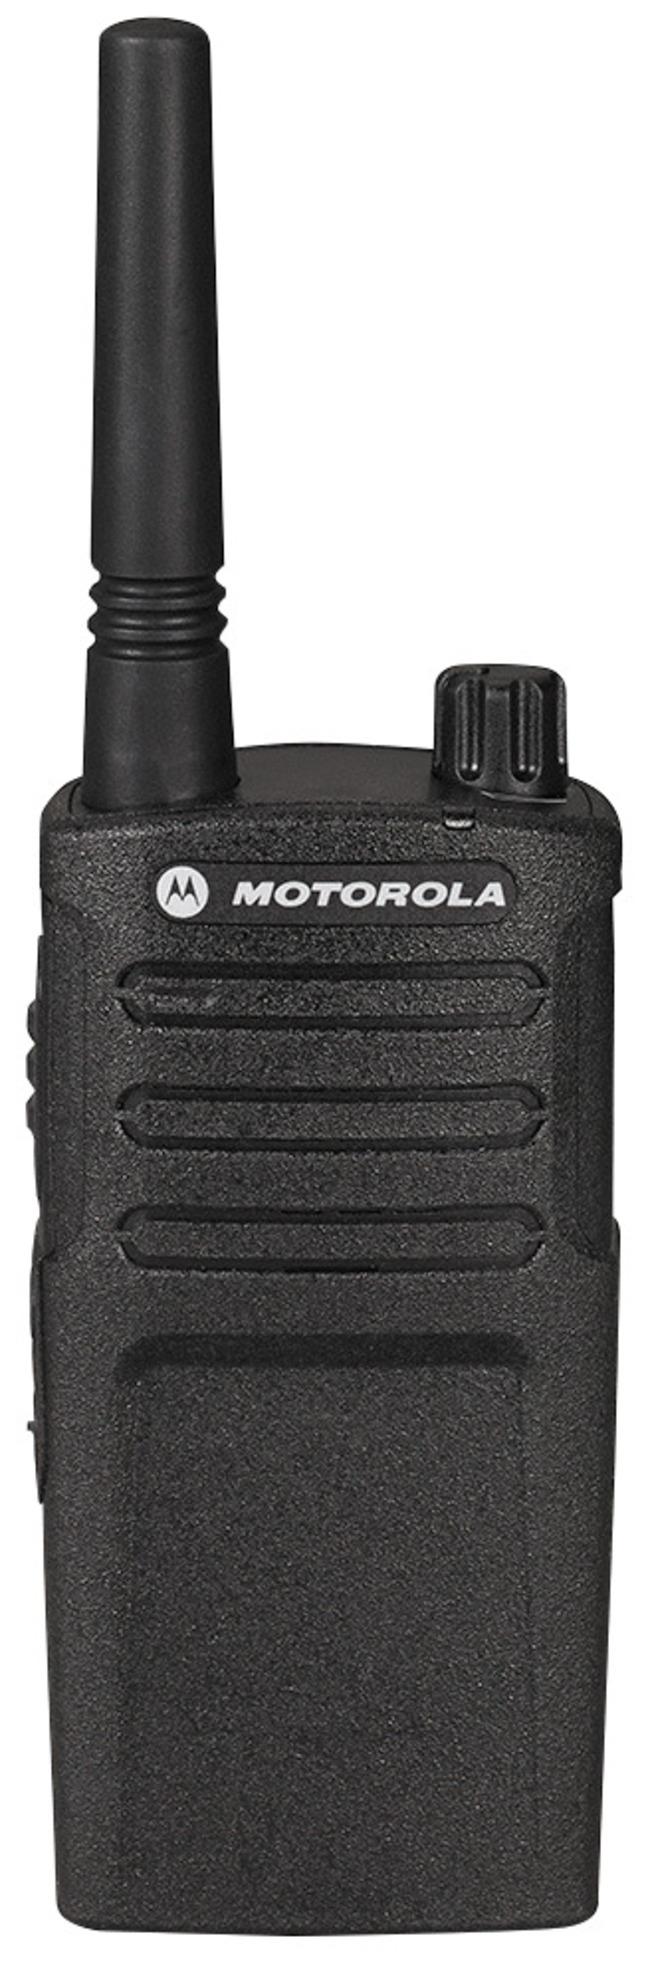 Radios, Headsets, Item Number 1464996